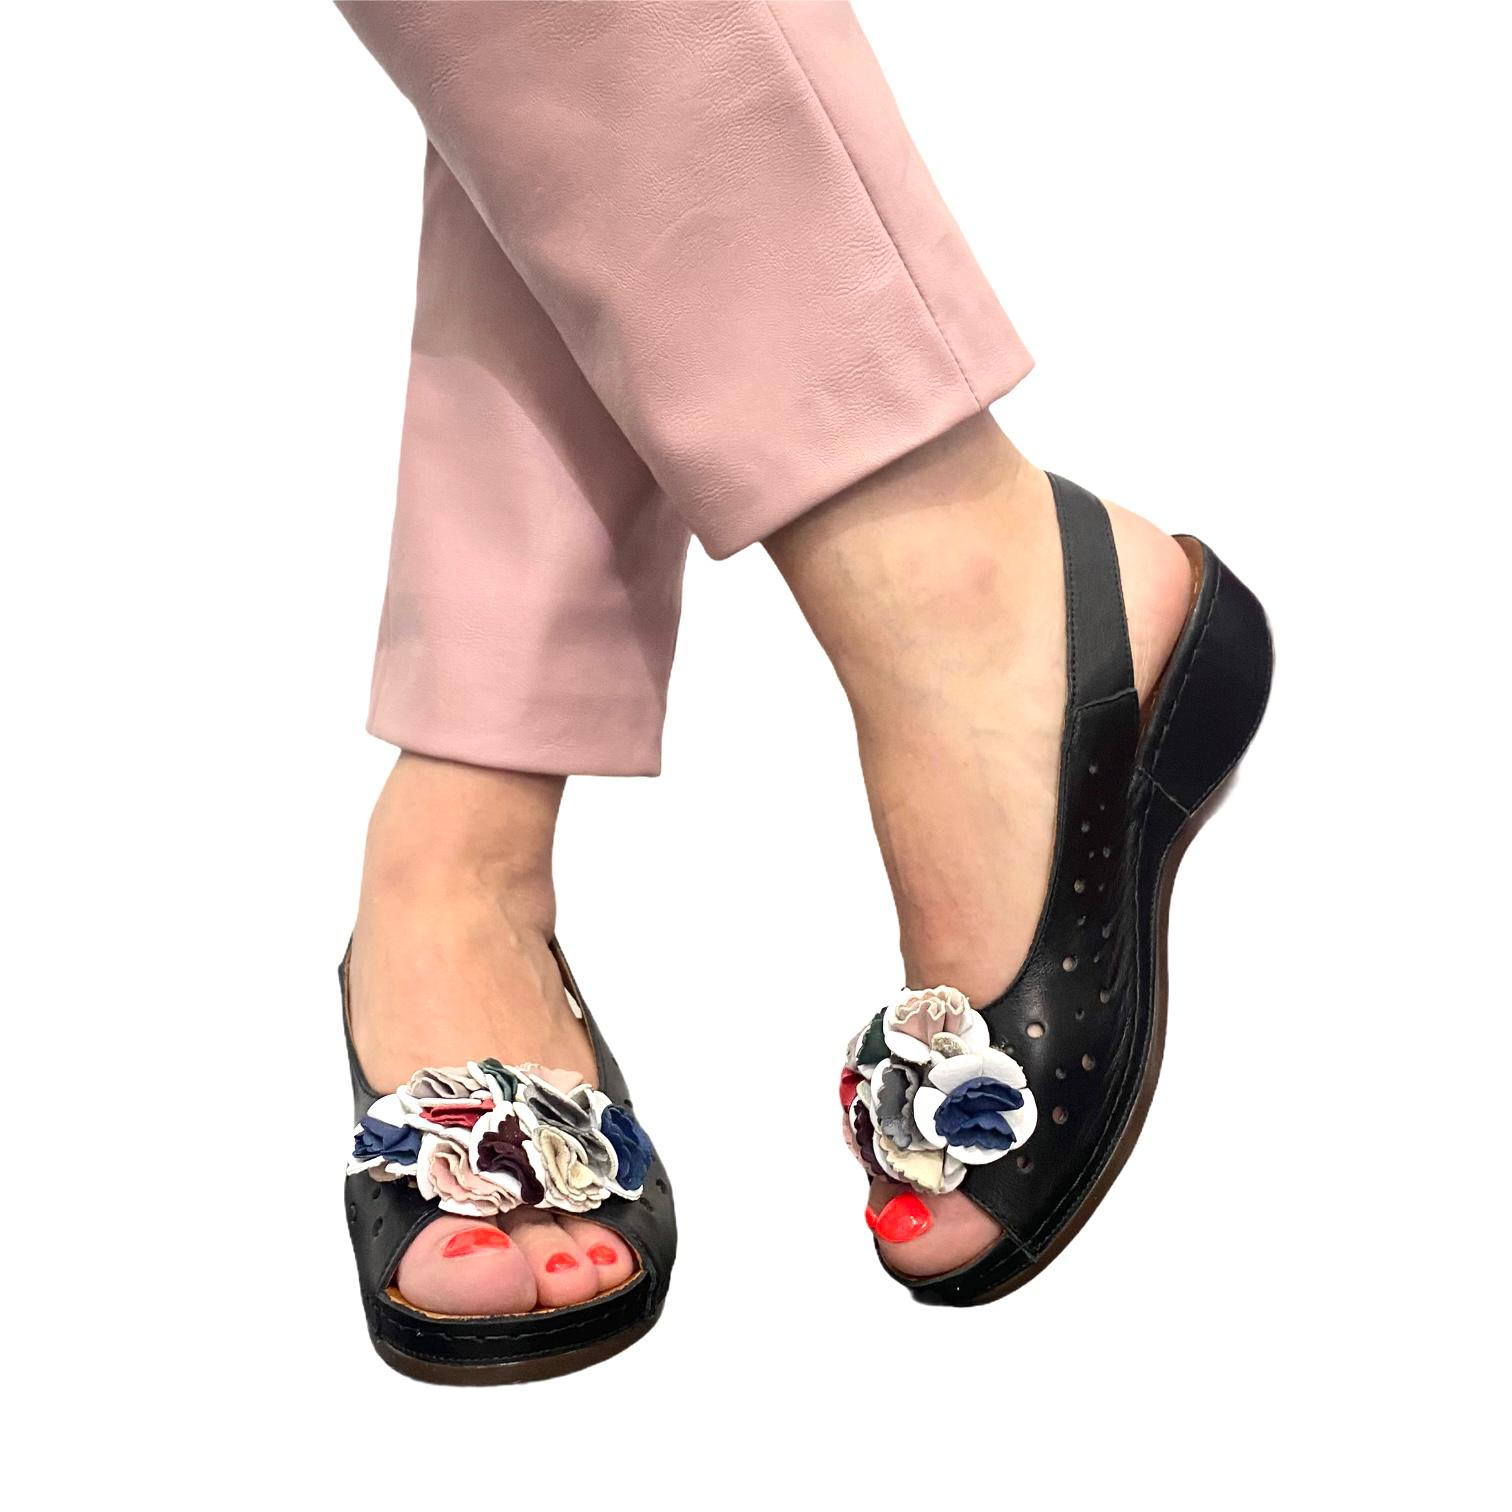 Sandale negre perforate cu accesoriu colorat